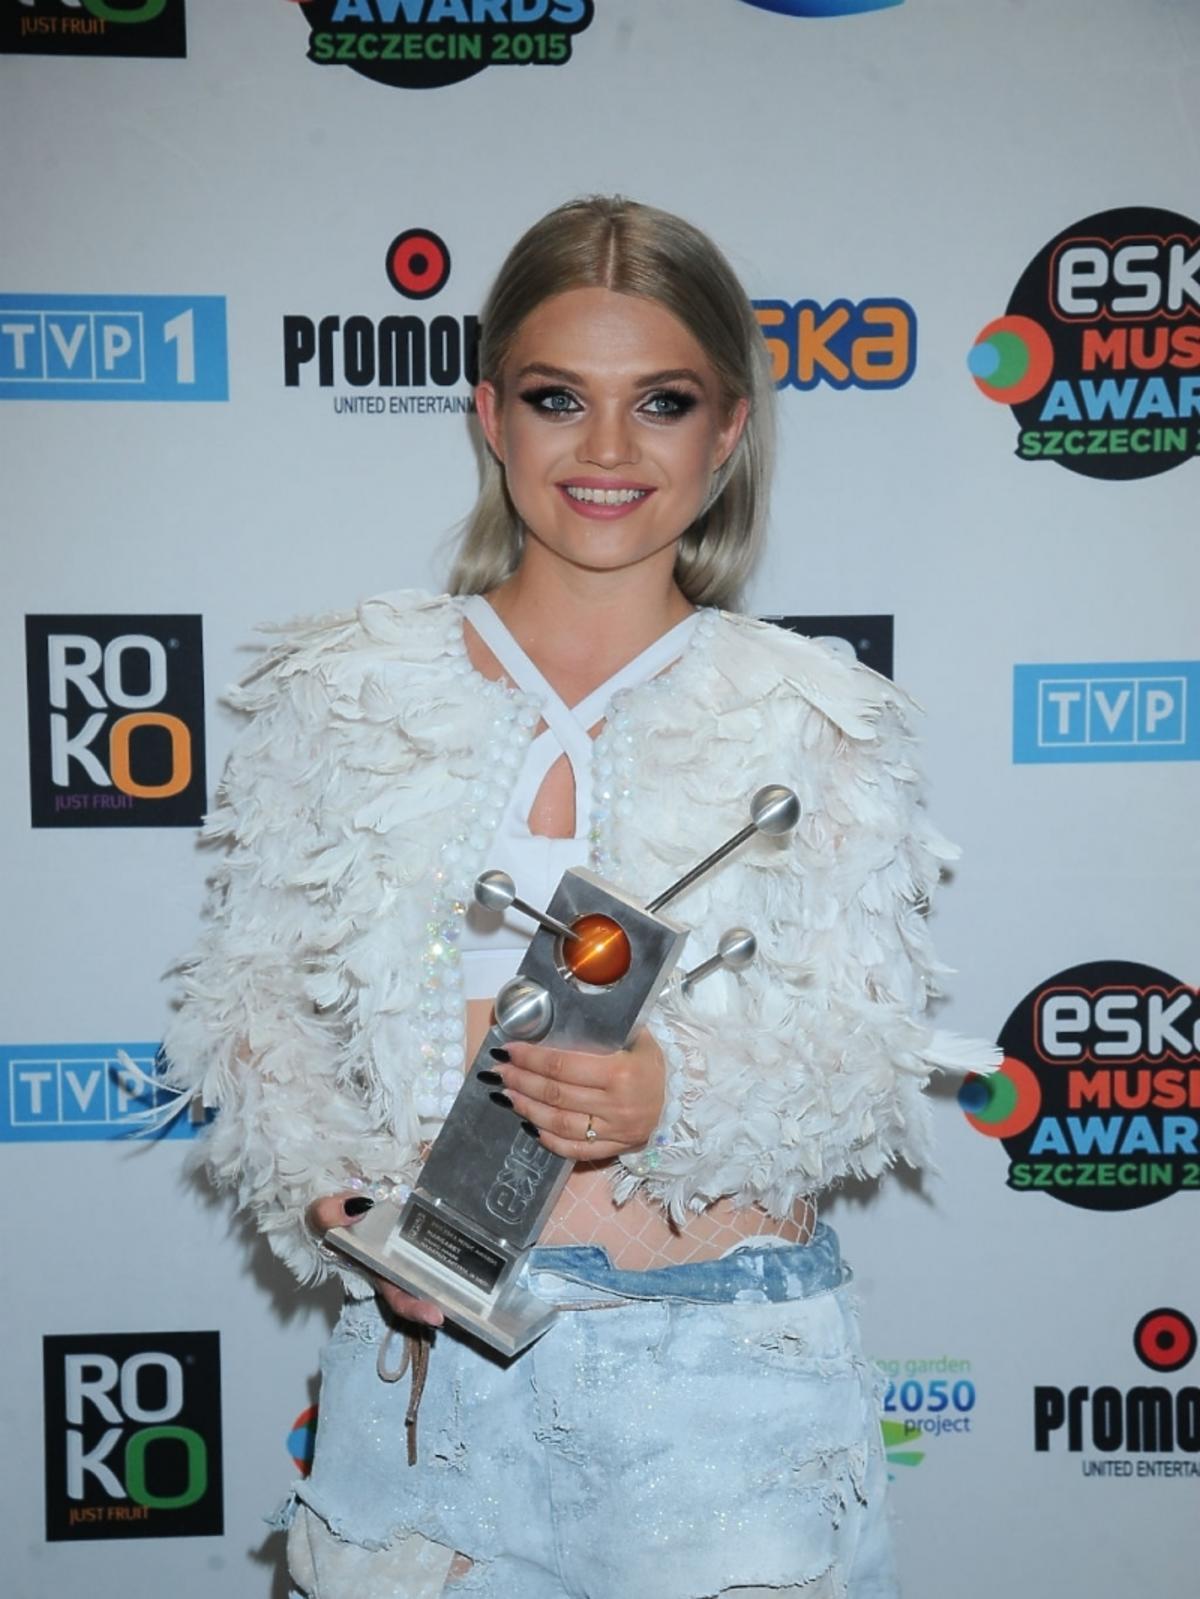 Eska Music Awards 2015 - Margaret z nagrodą